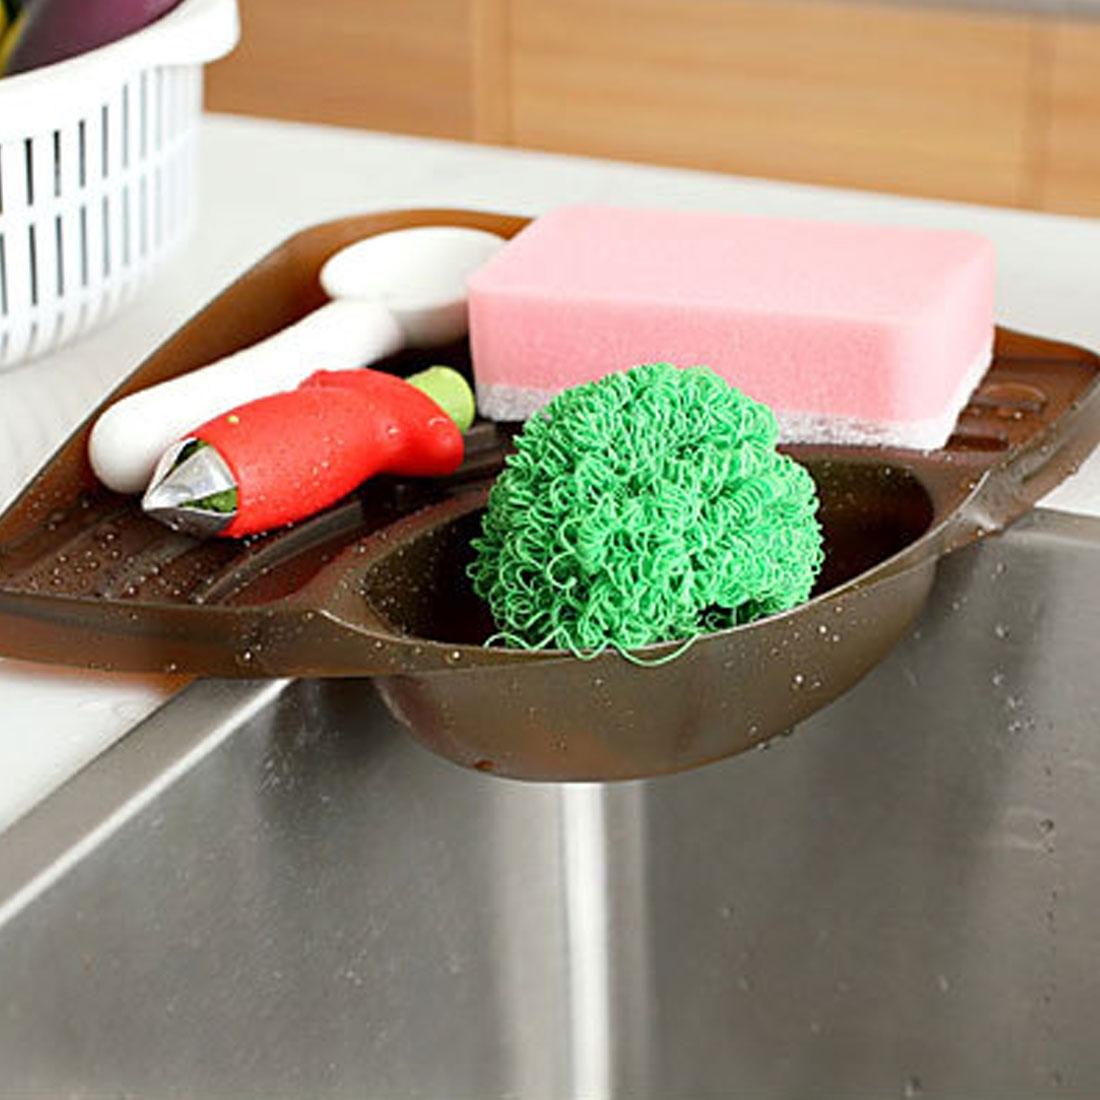 Practical Kitchen Sink Corner Storage Rack Sponge Holder Wall Mounted Tray (Green)